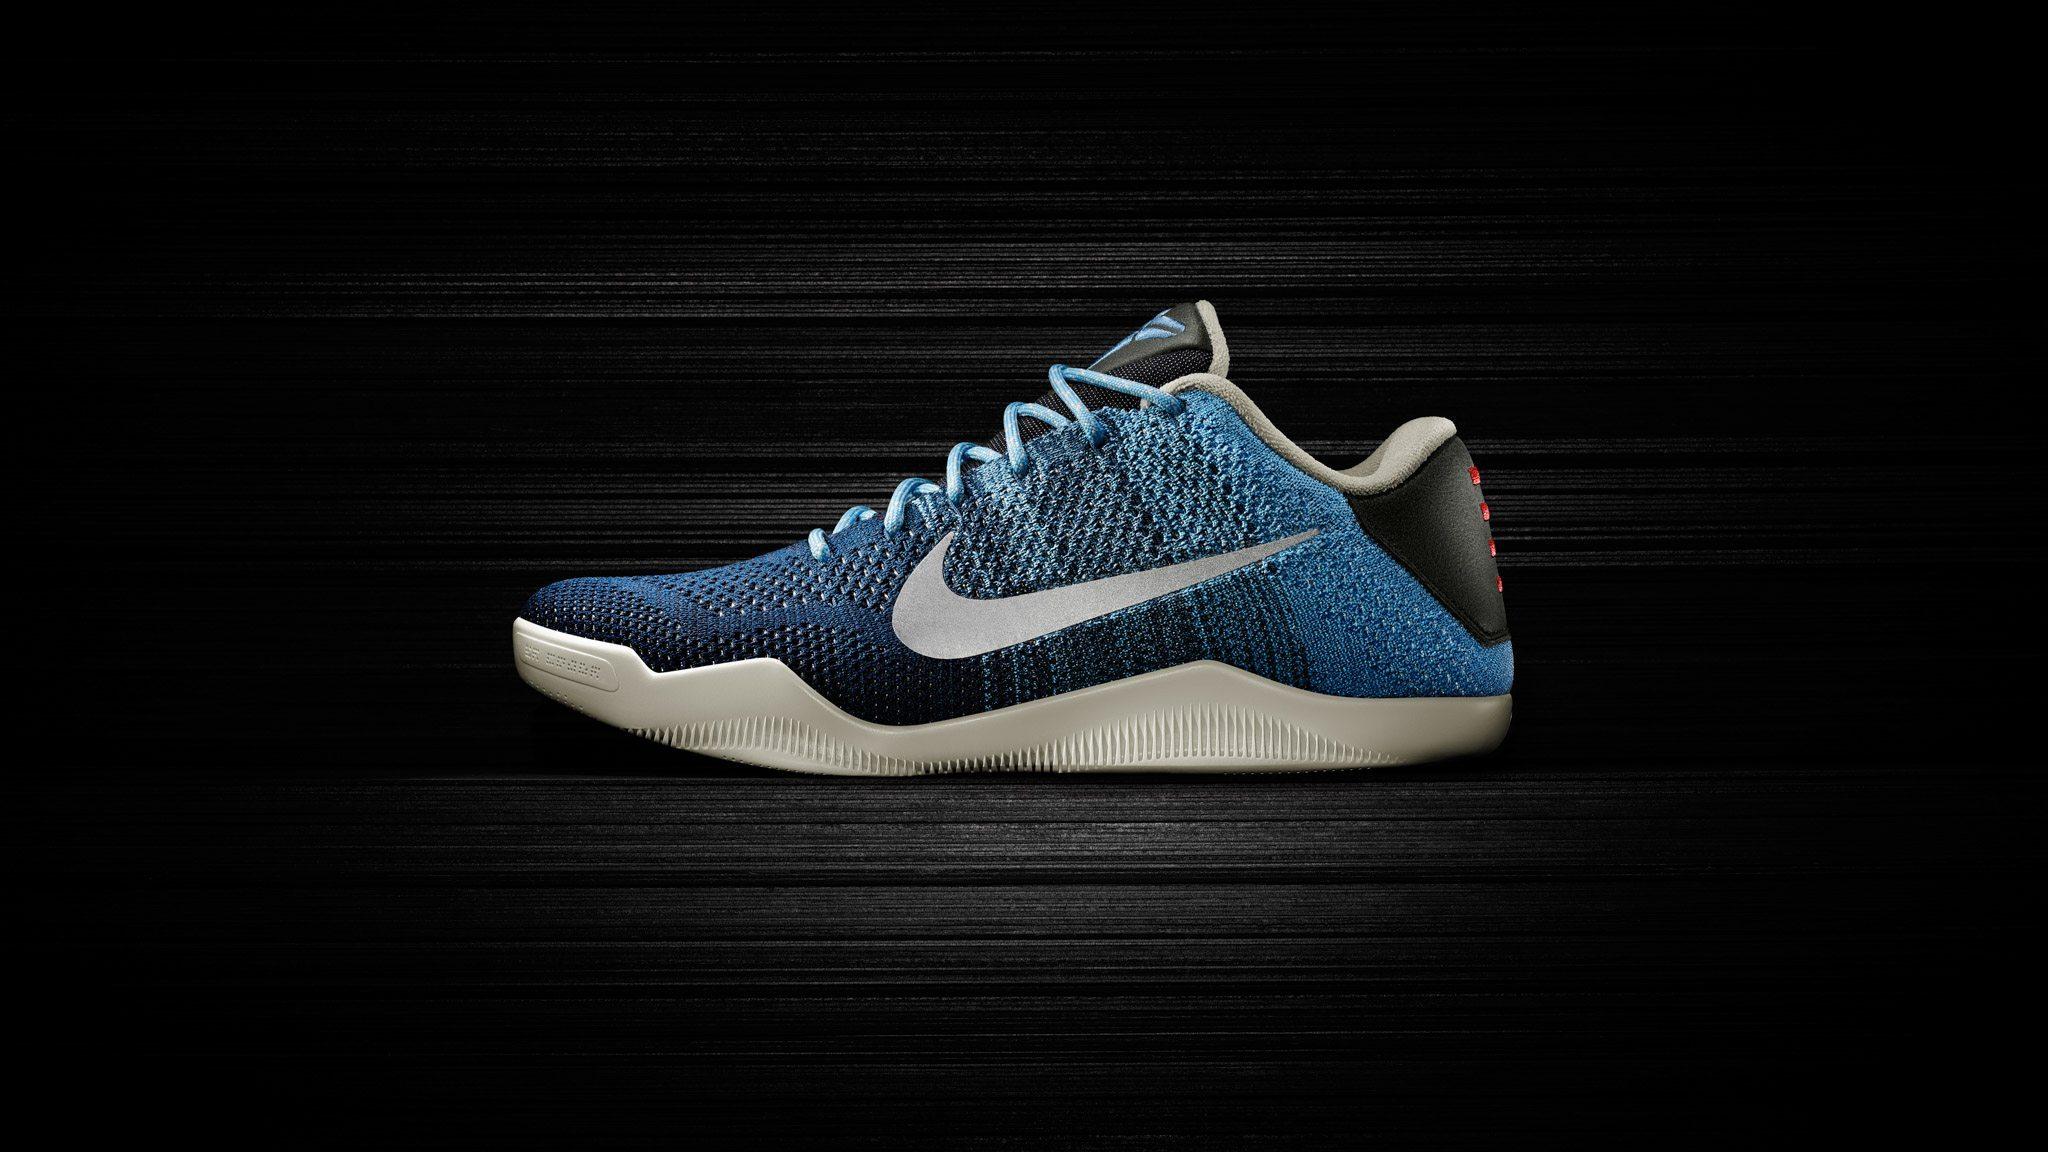 Nike Kobe 11 Muse Pack 5